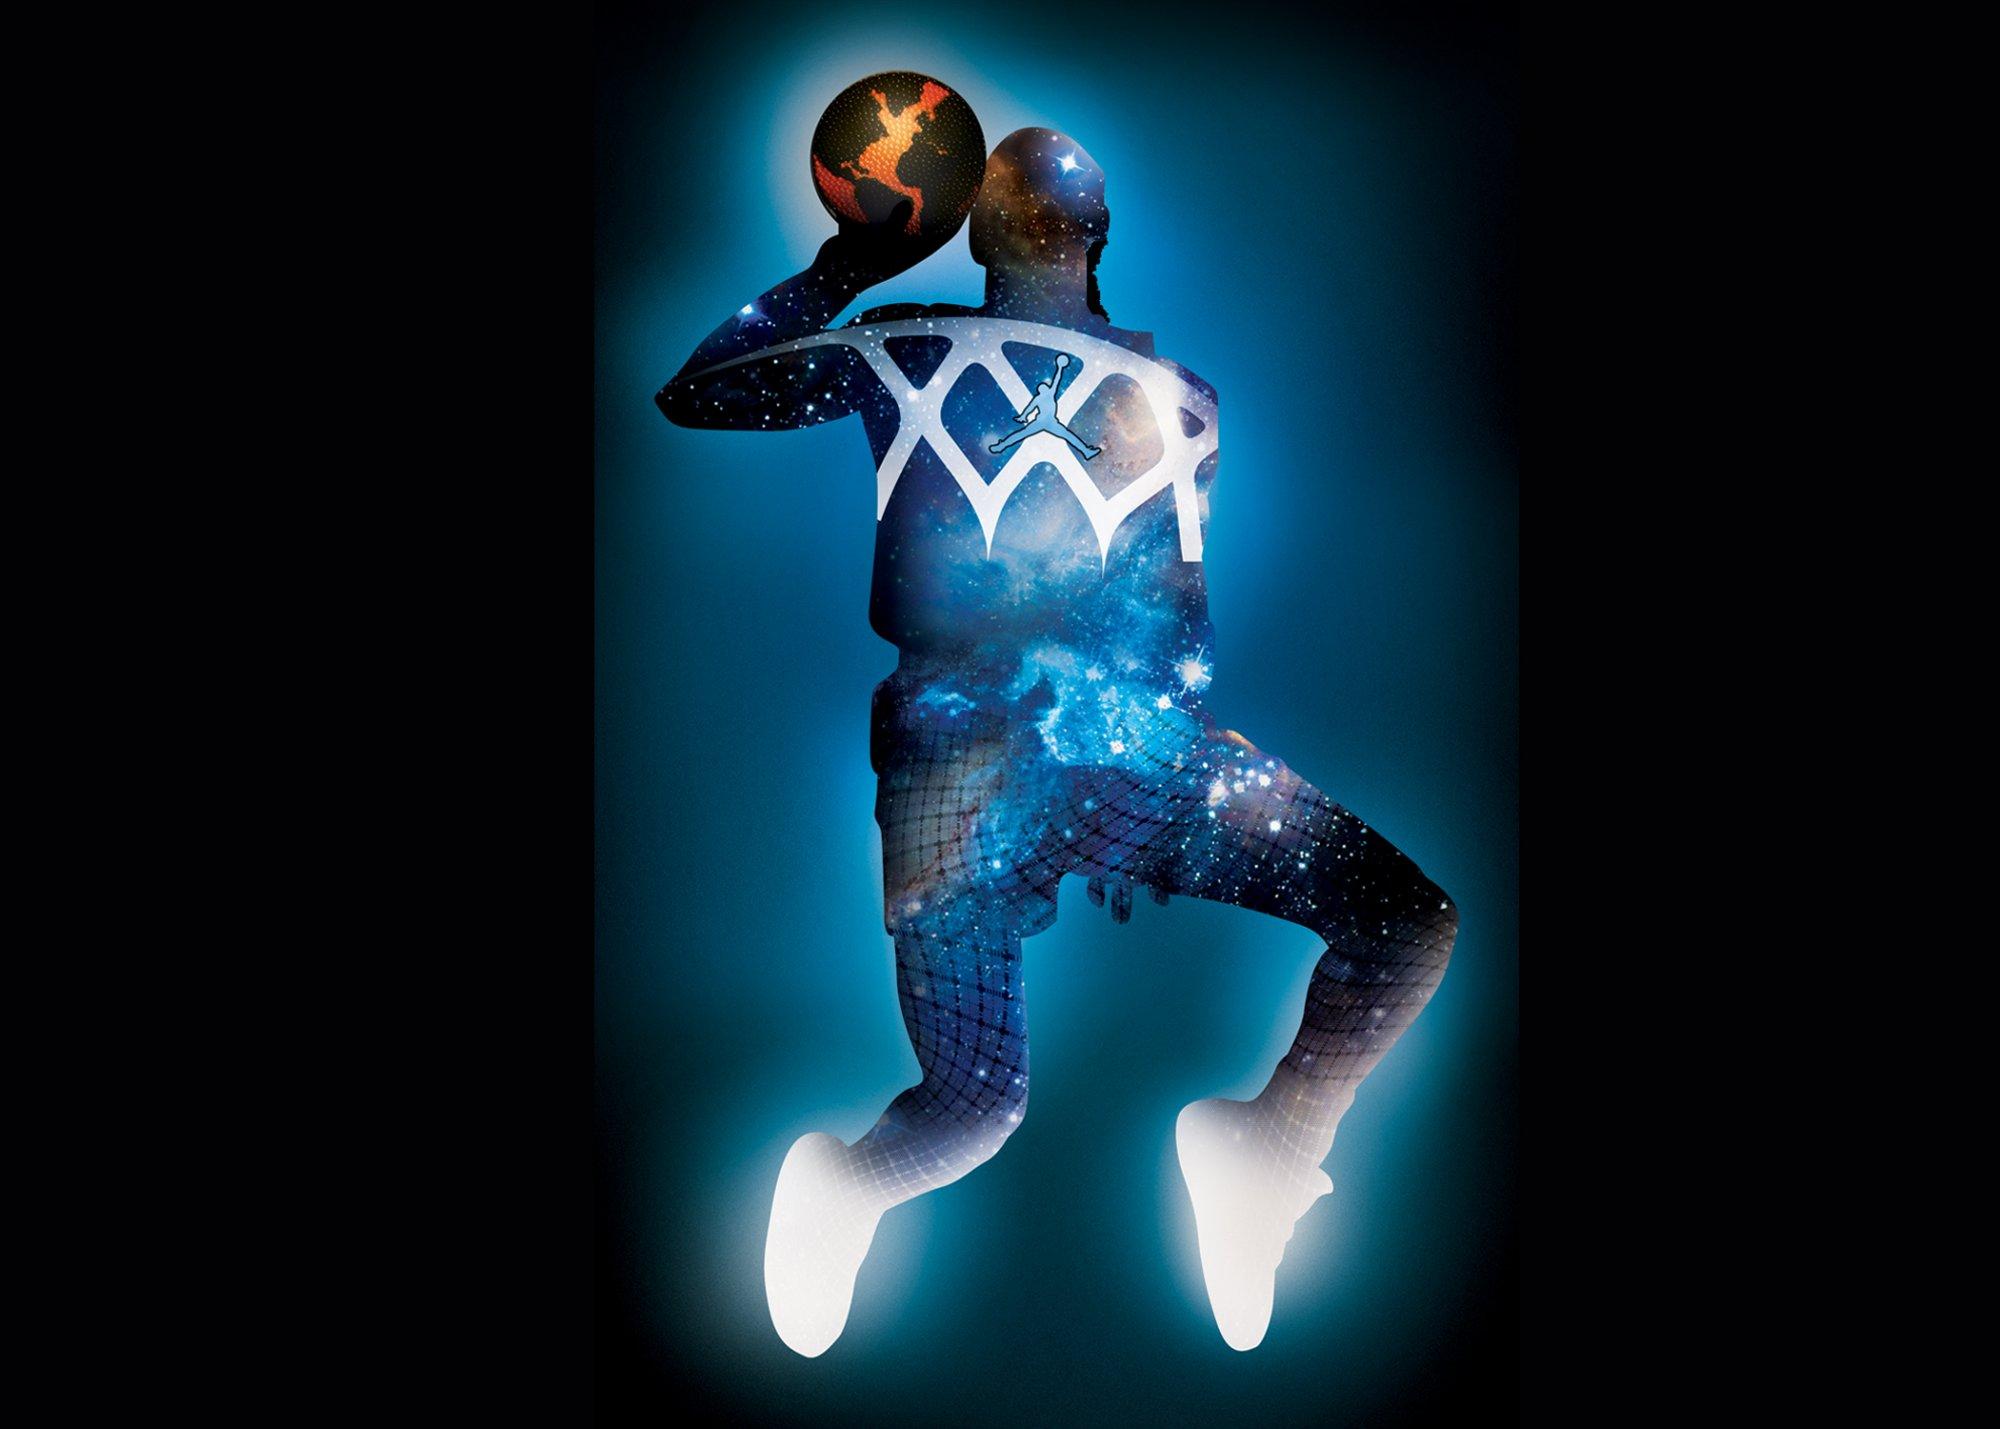 Nike Basketball Hd Wallpaper Air Jordan Xxx Release Date Official Images Air 23